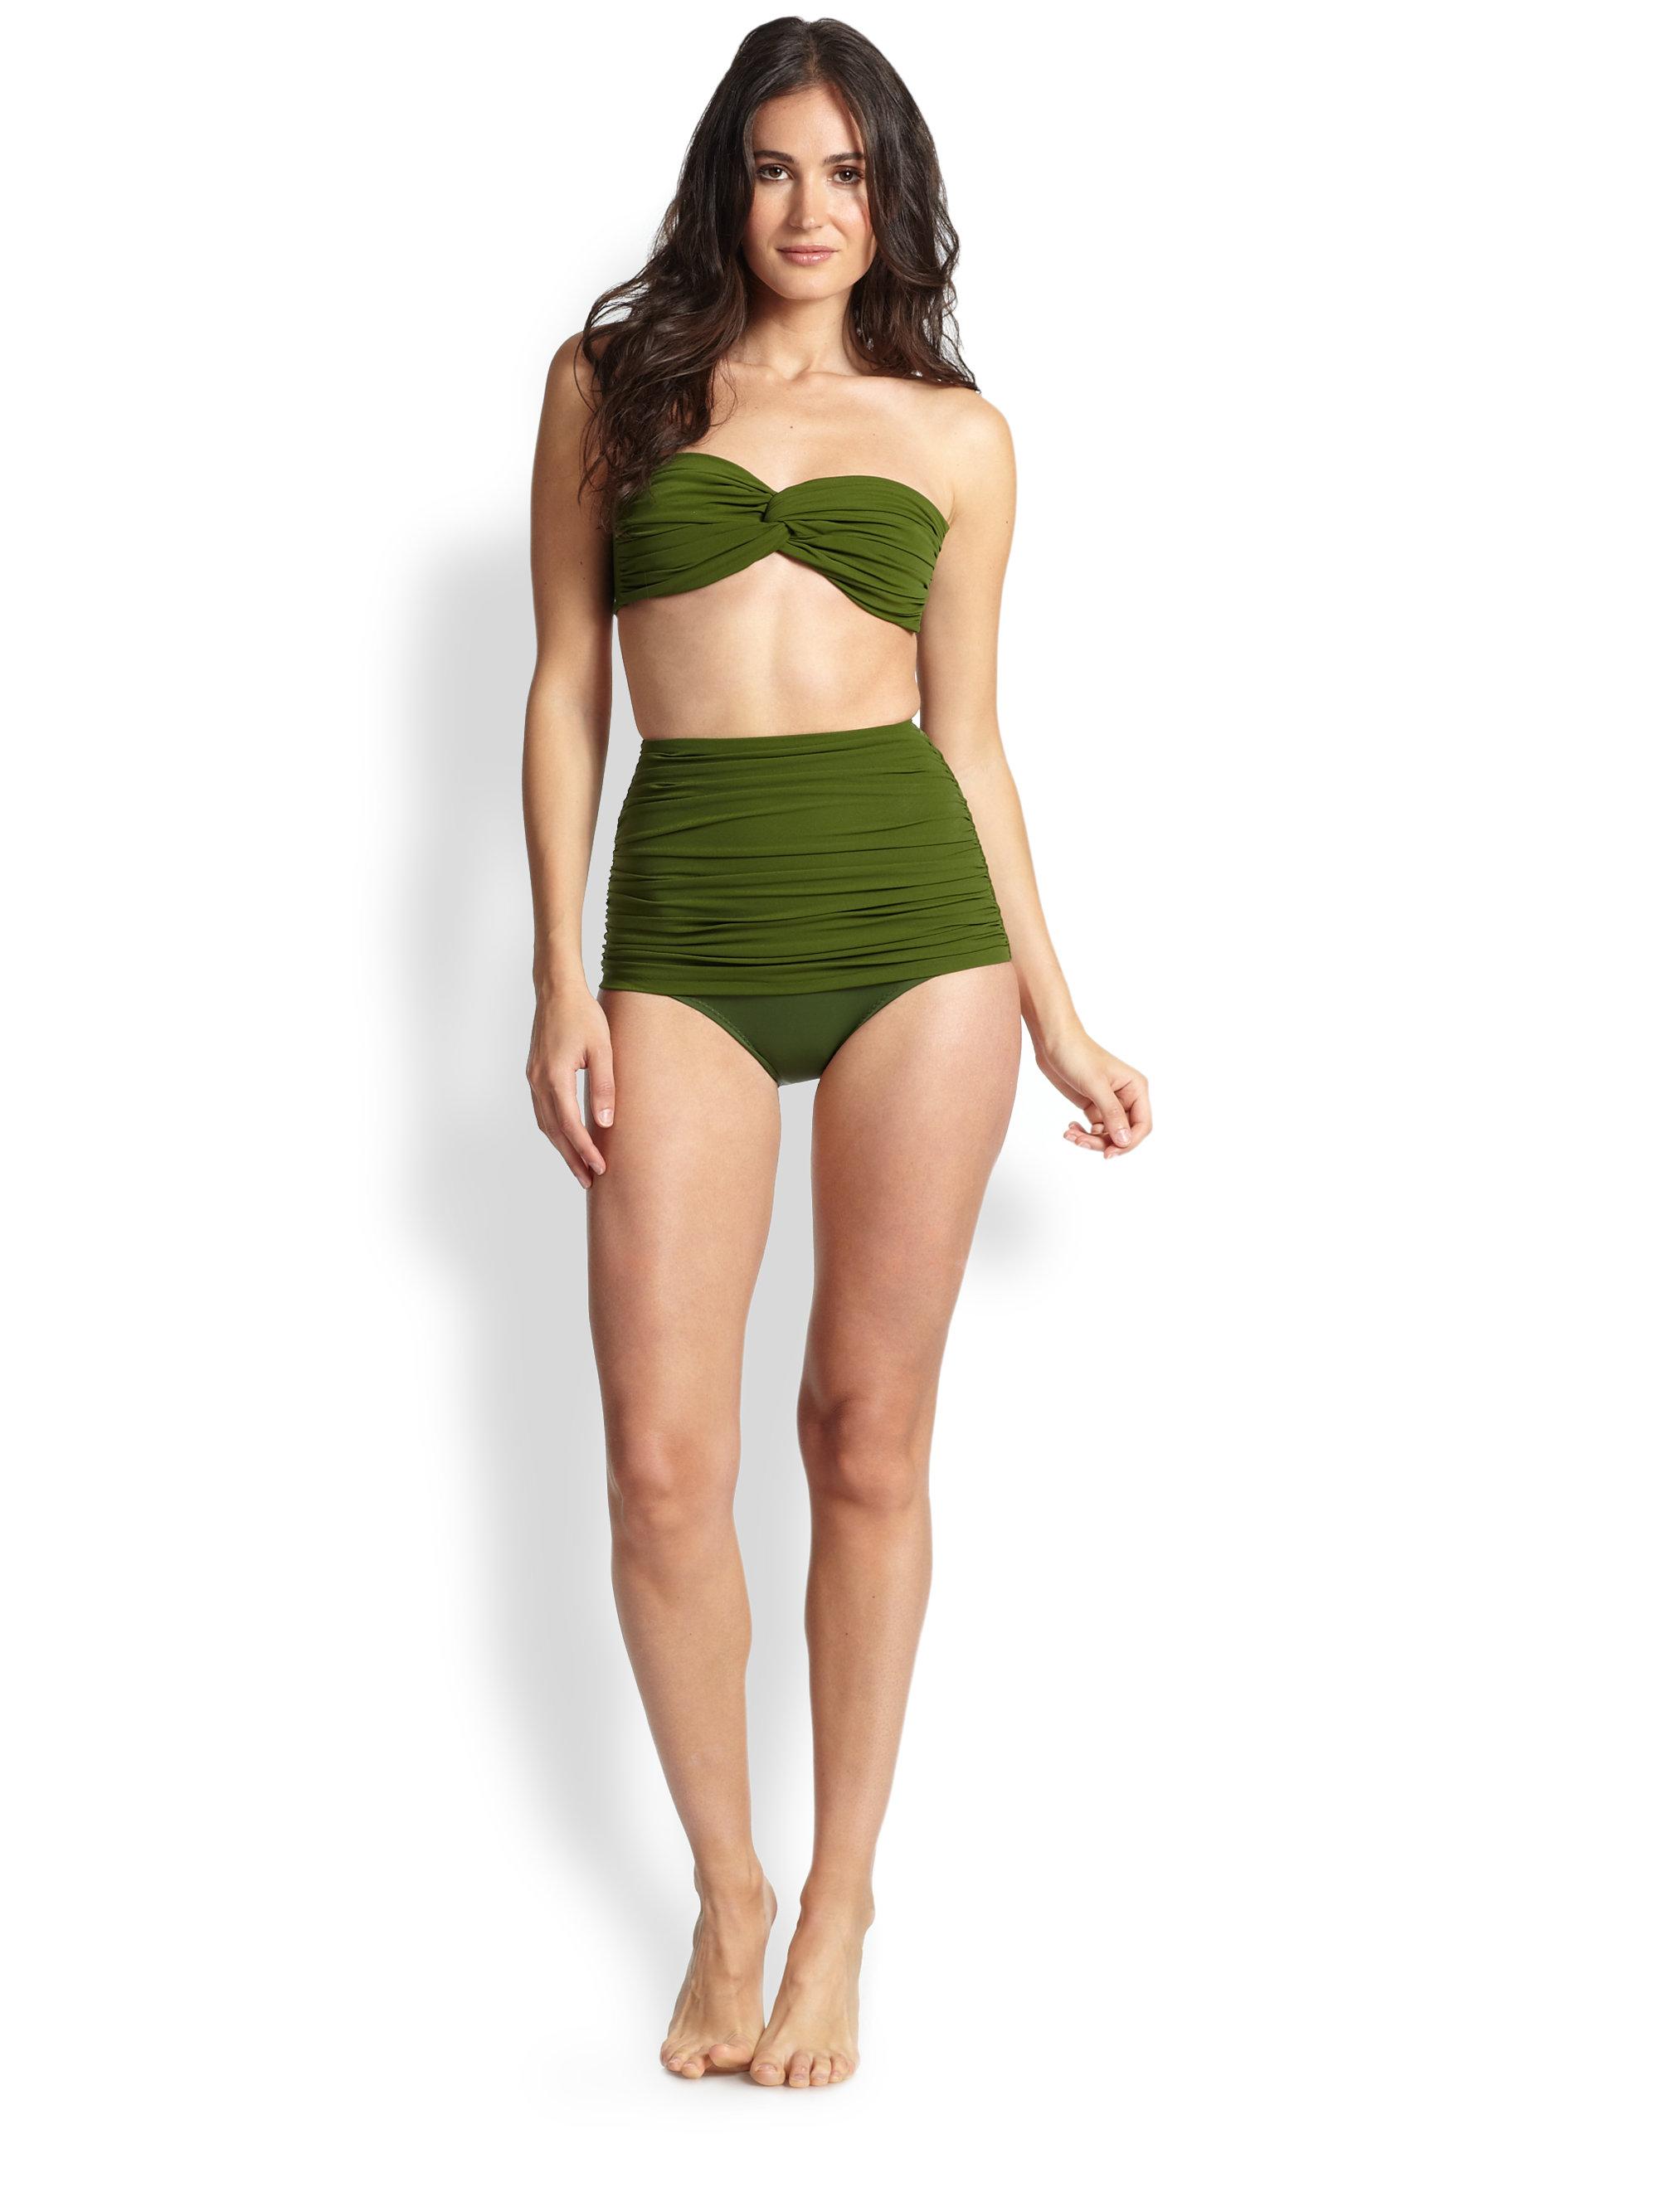 Lyst - Norma Kamali High-Waist Ruched Bikini Bottom in Green a50b4493520a